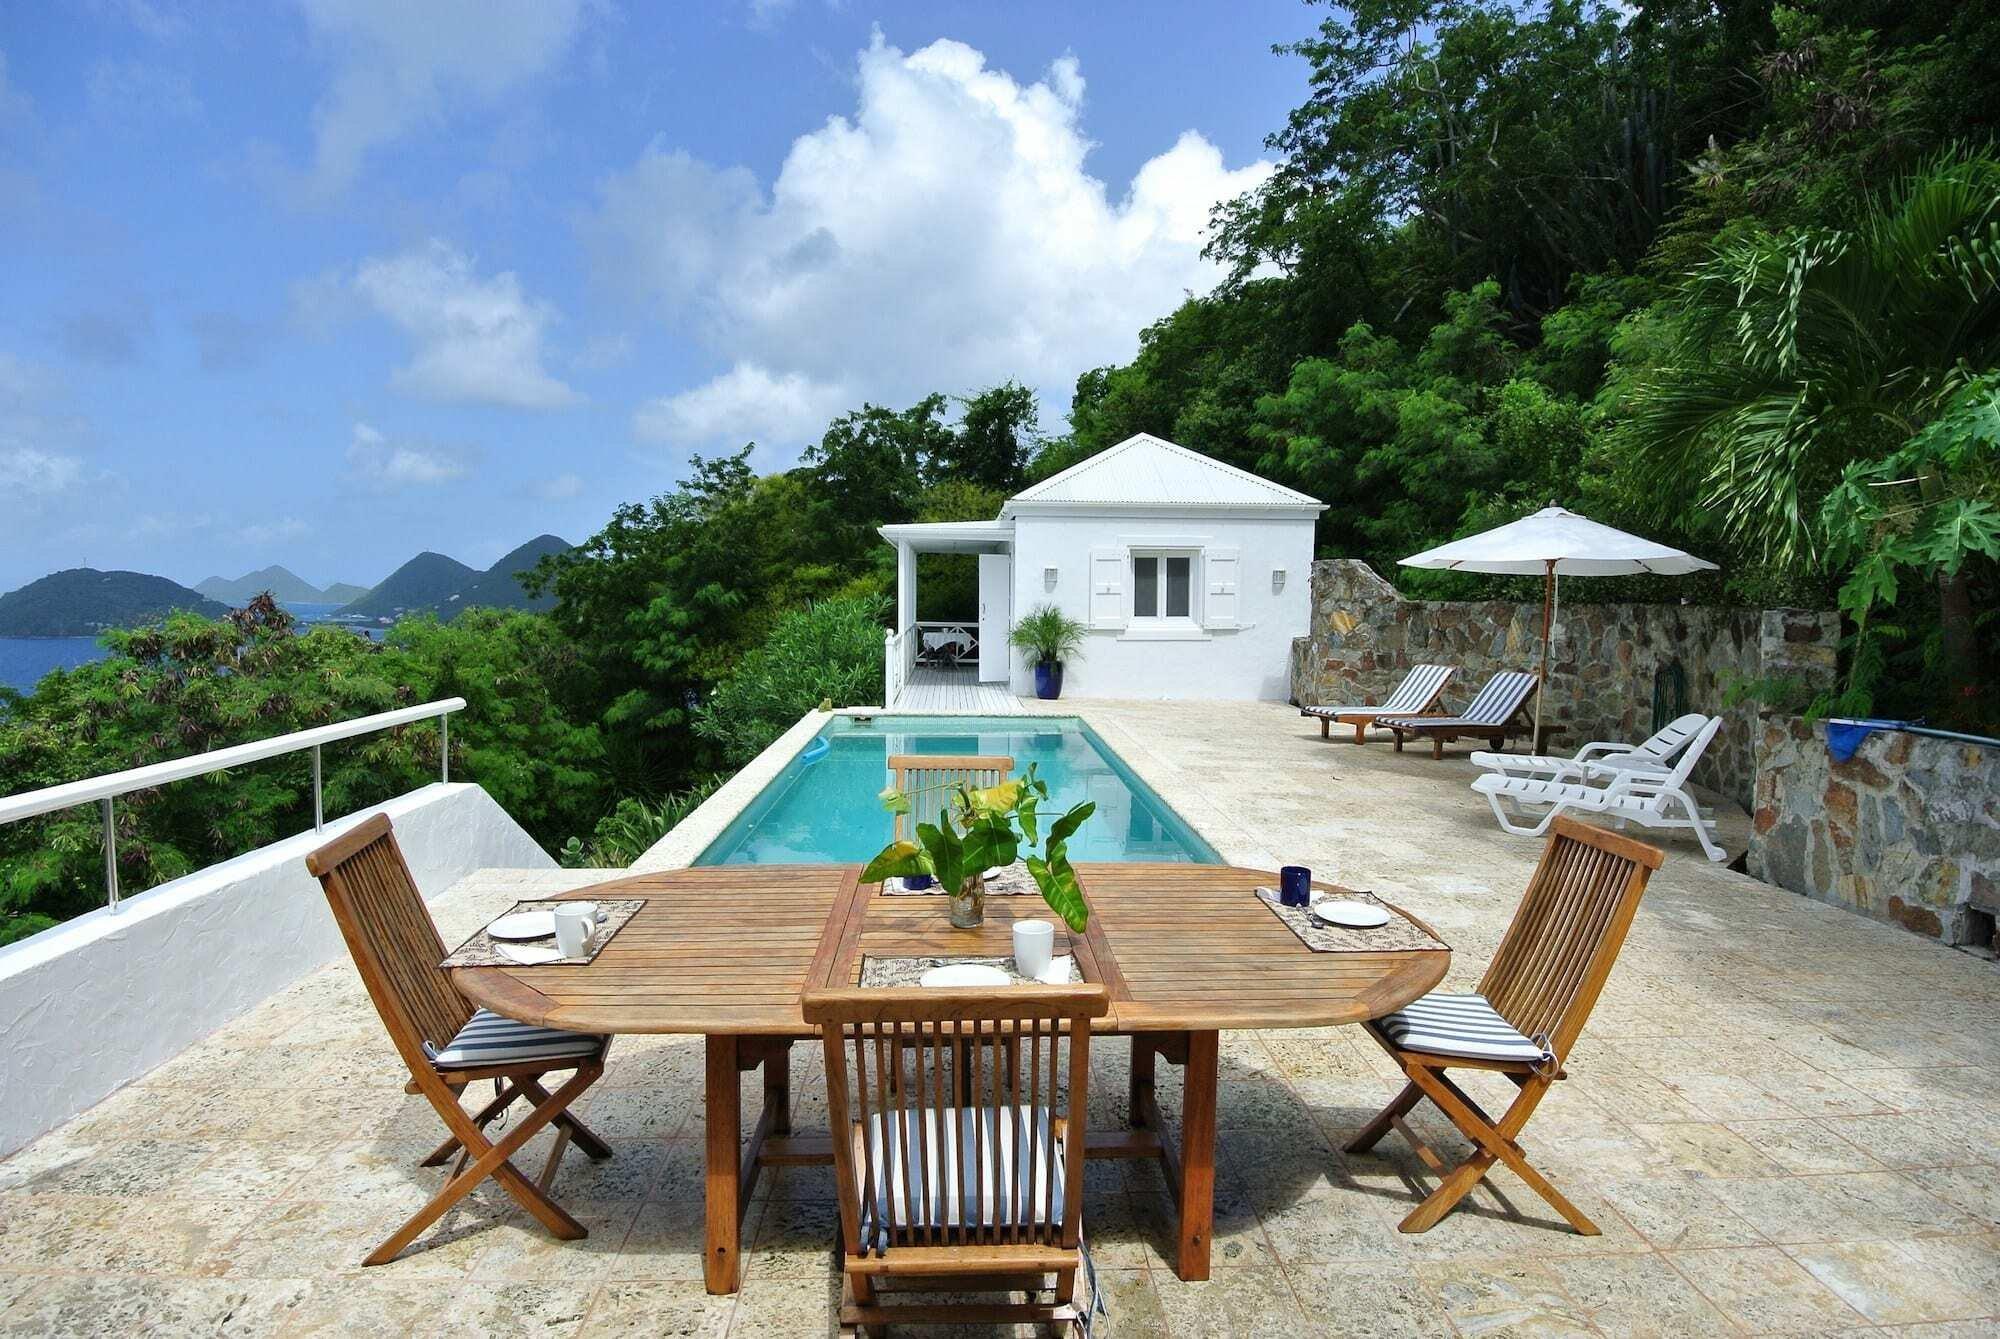 House in British Virgin Islands 1 - 11188717